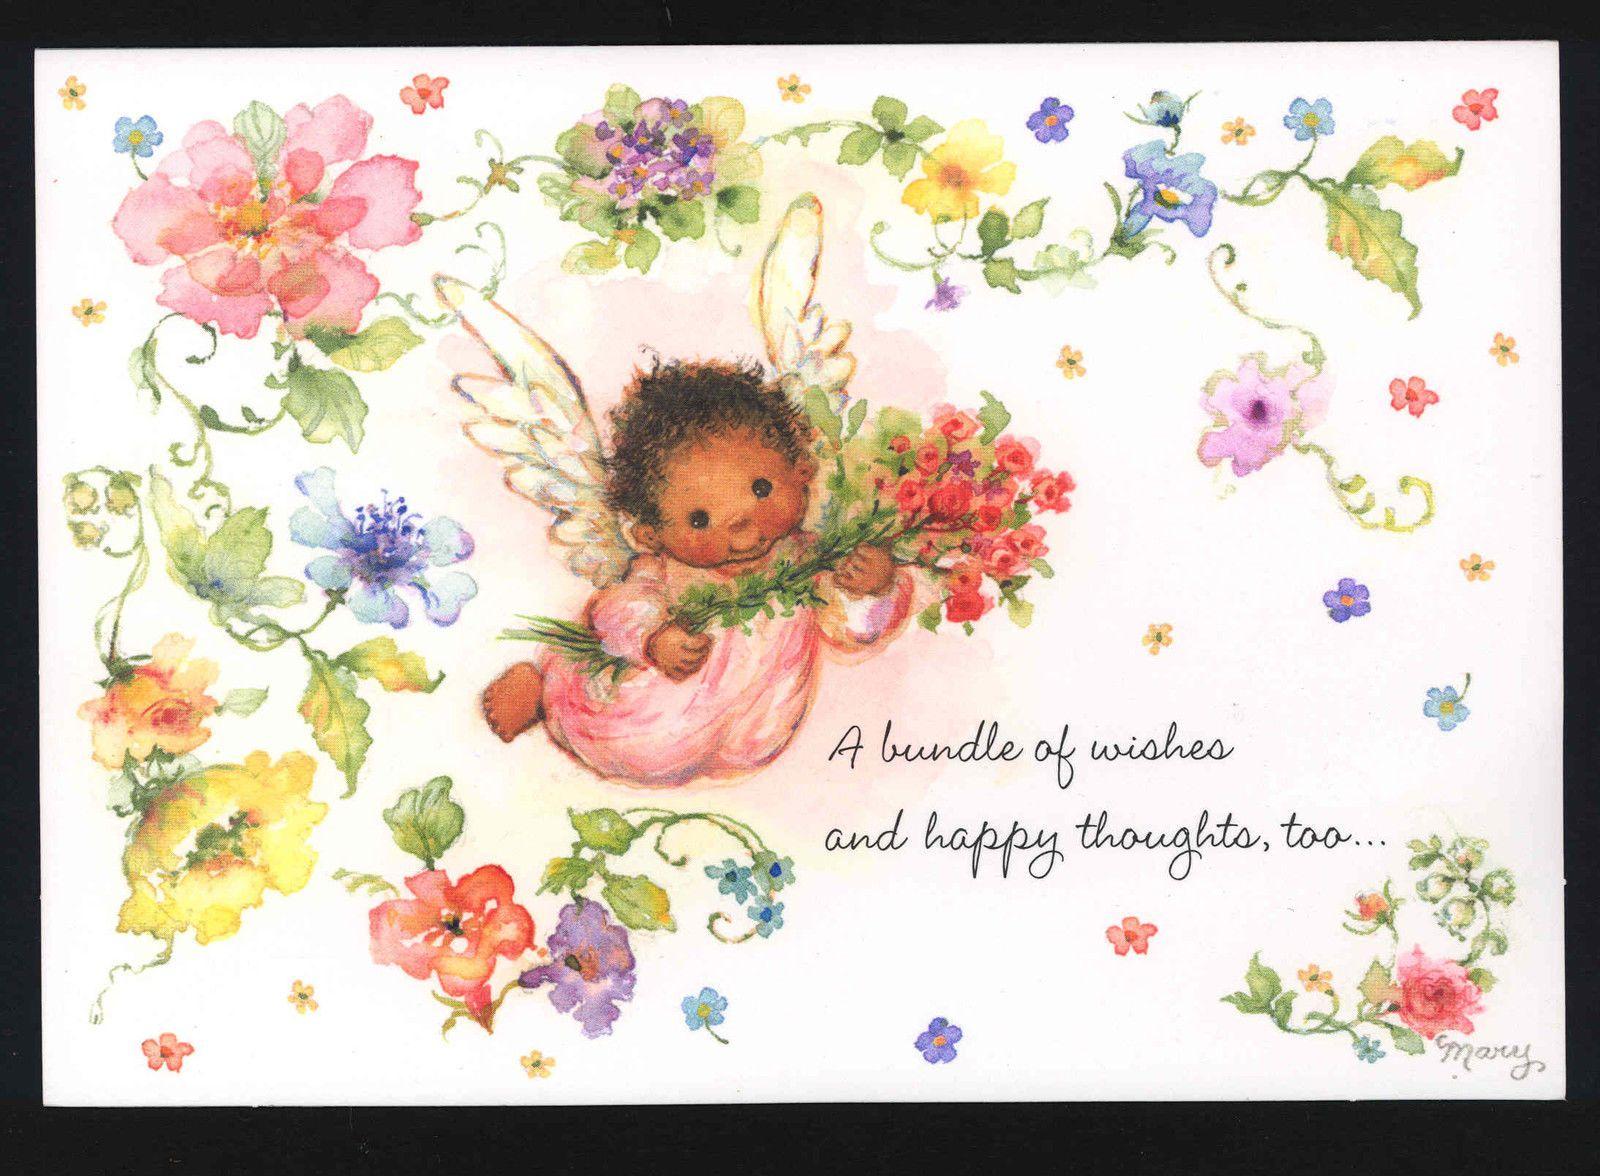 Mint Mary Hamilton Precious Black Angel Child With Roses Hallmark Card Ebay Hallmark Cards Hallmark Greeting Cards Vintage Birthday Cards